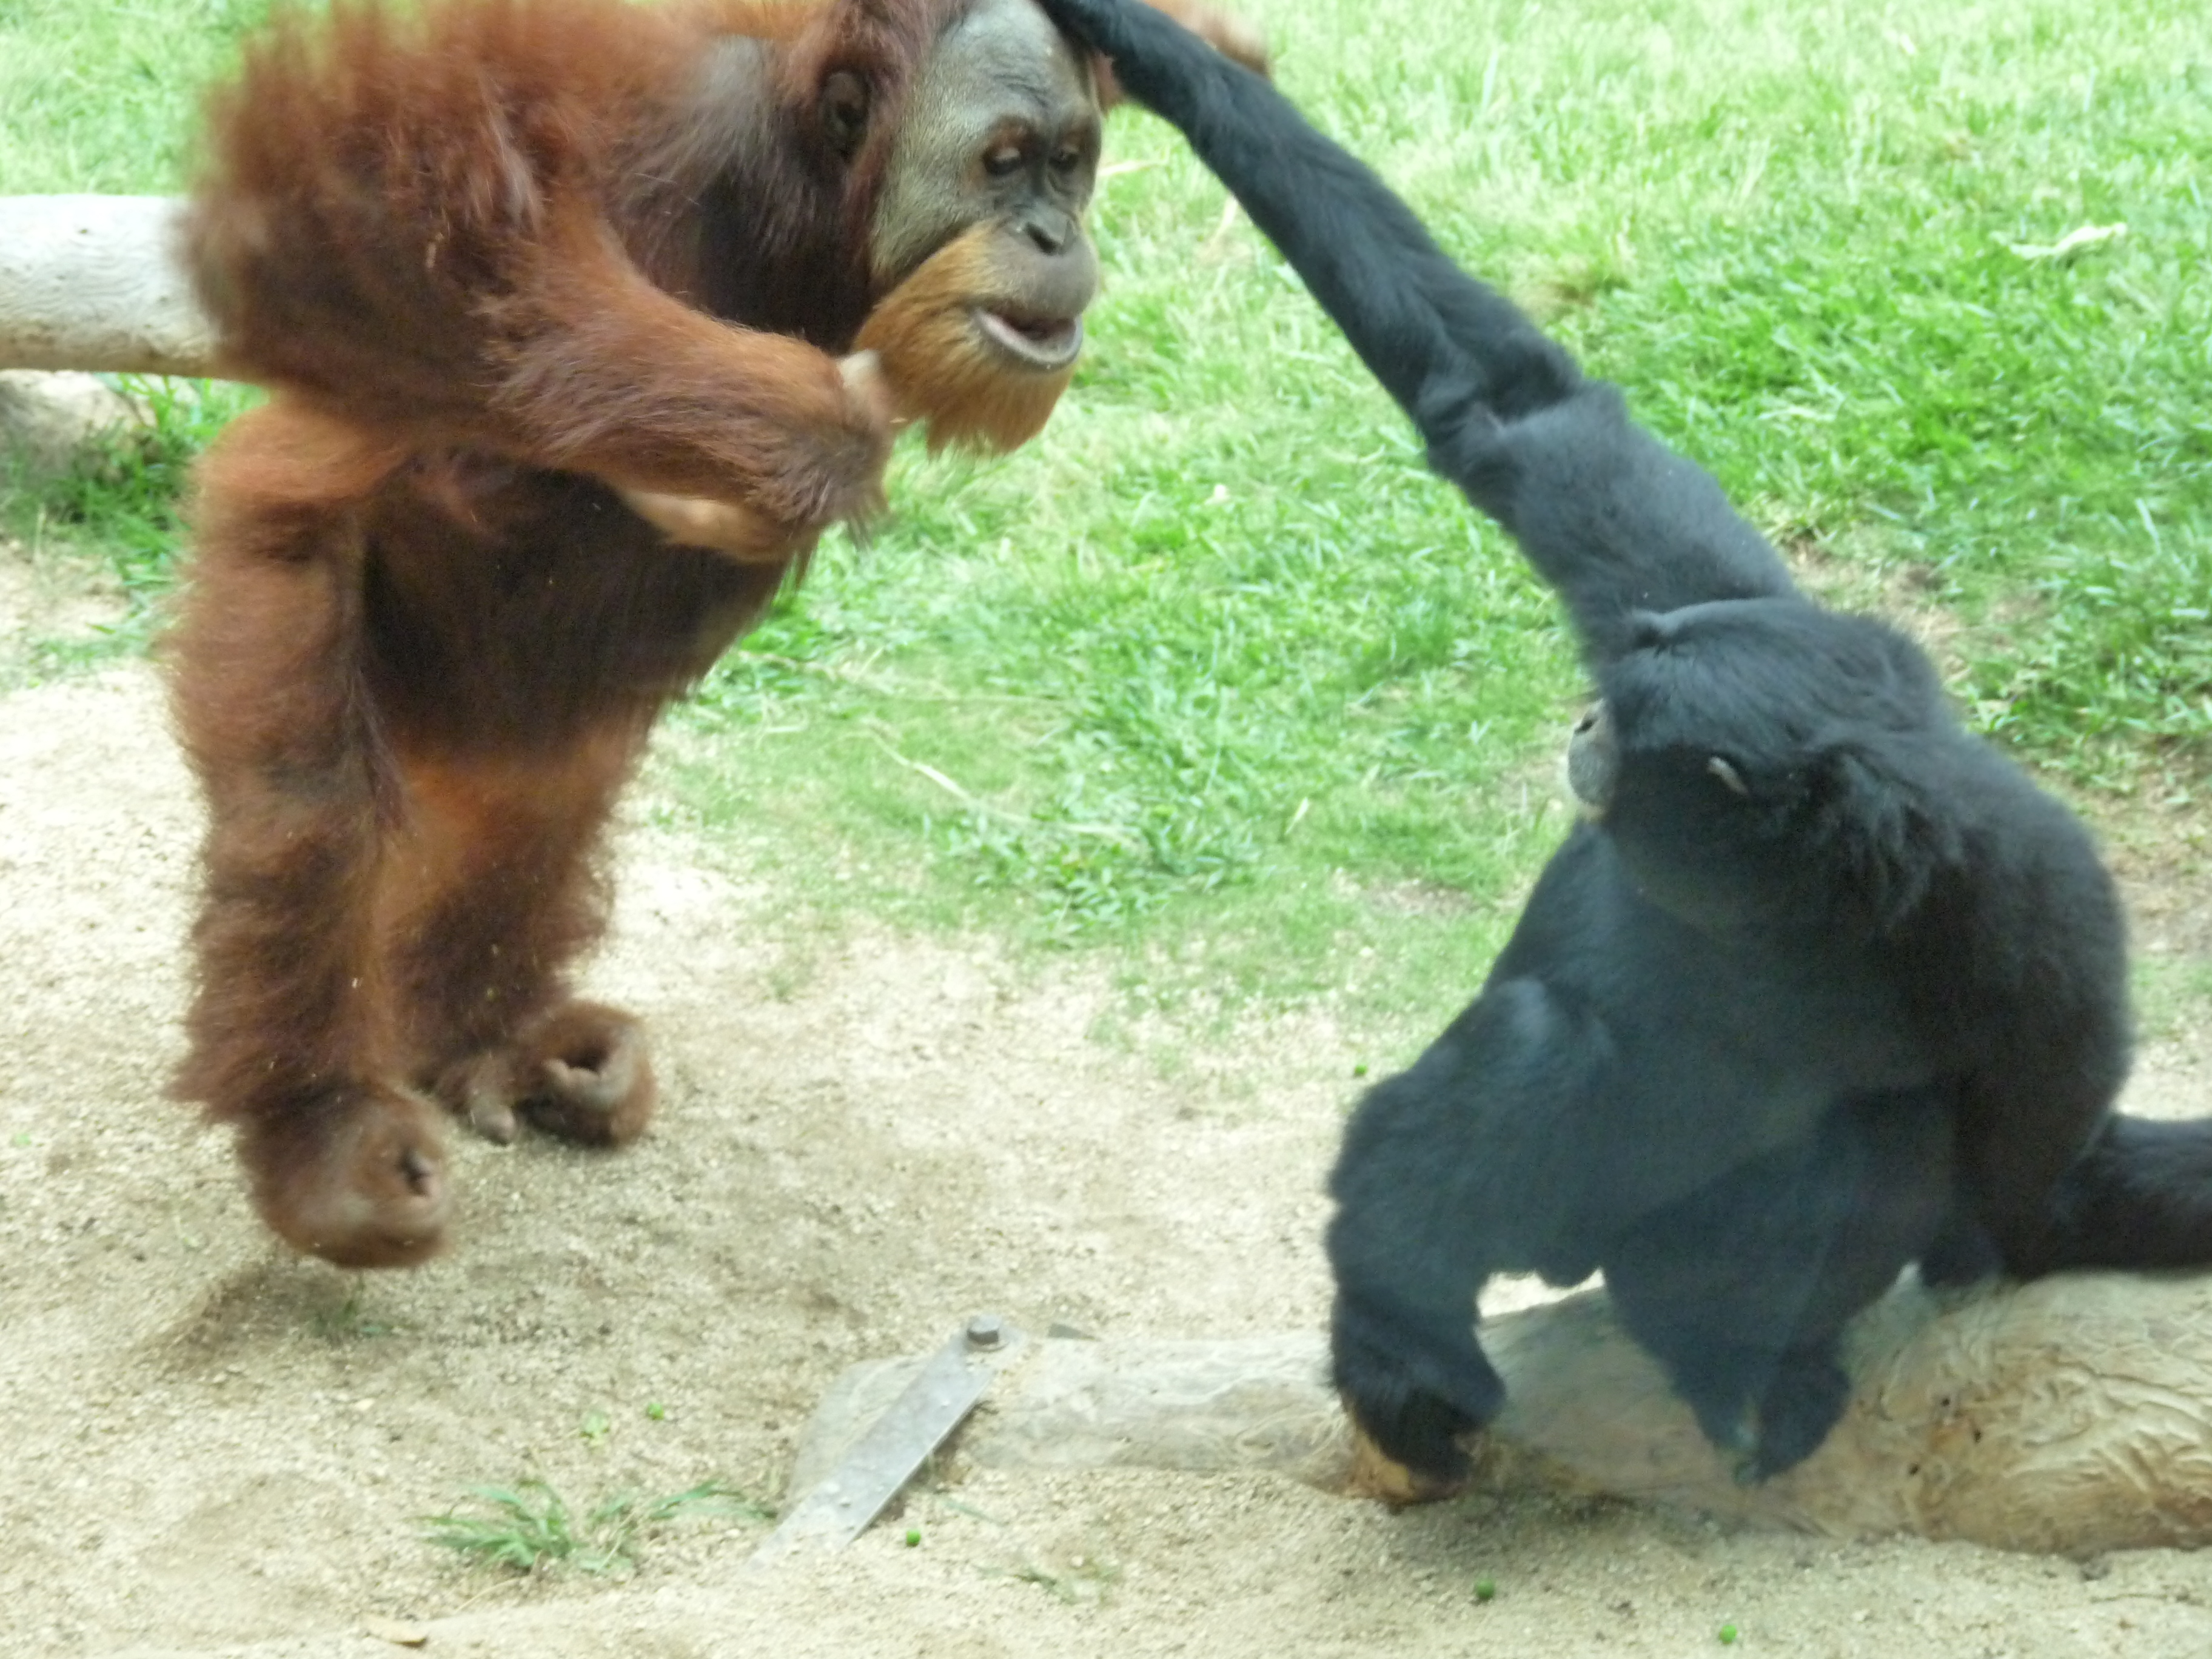 This Orangutan was not happy when his food was stolen...The San Diego Zoo